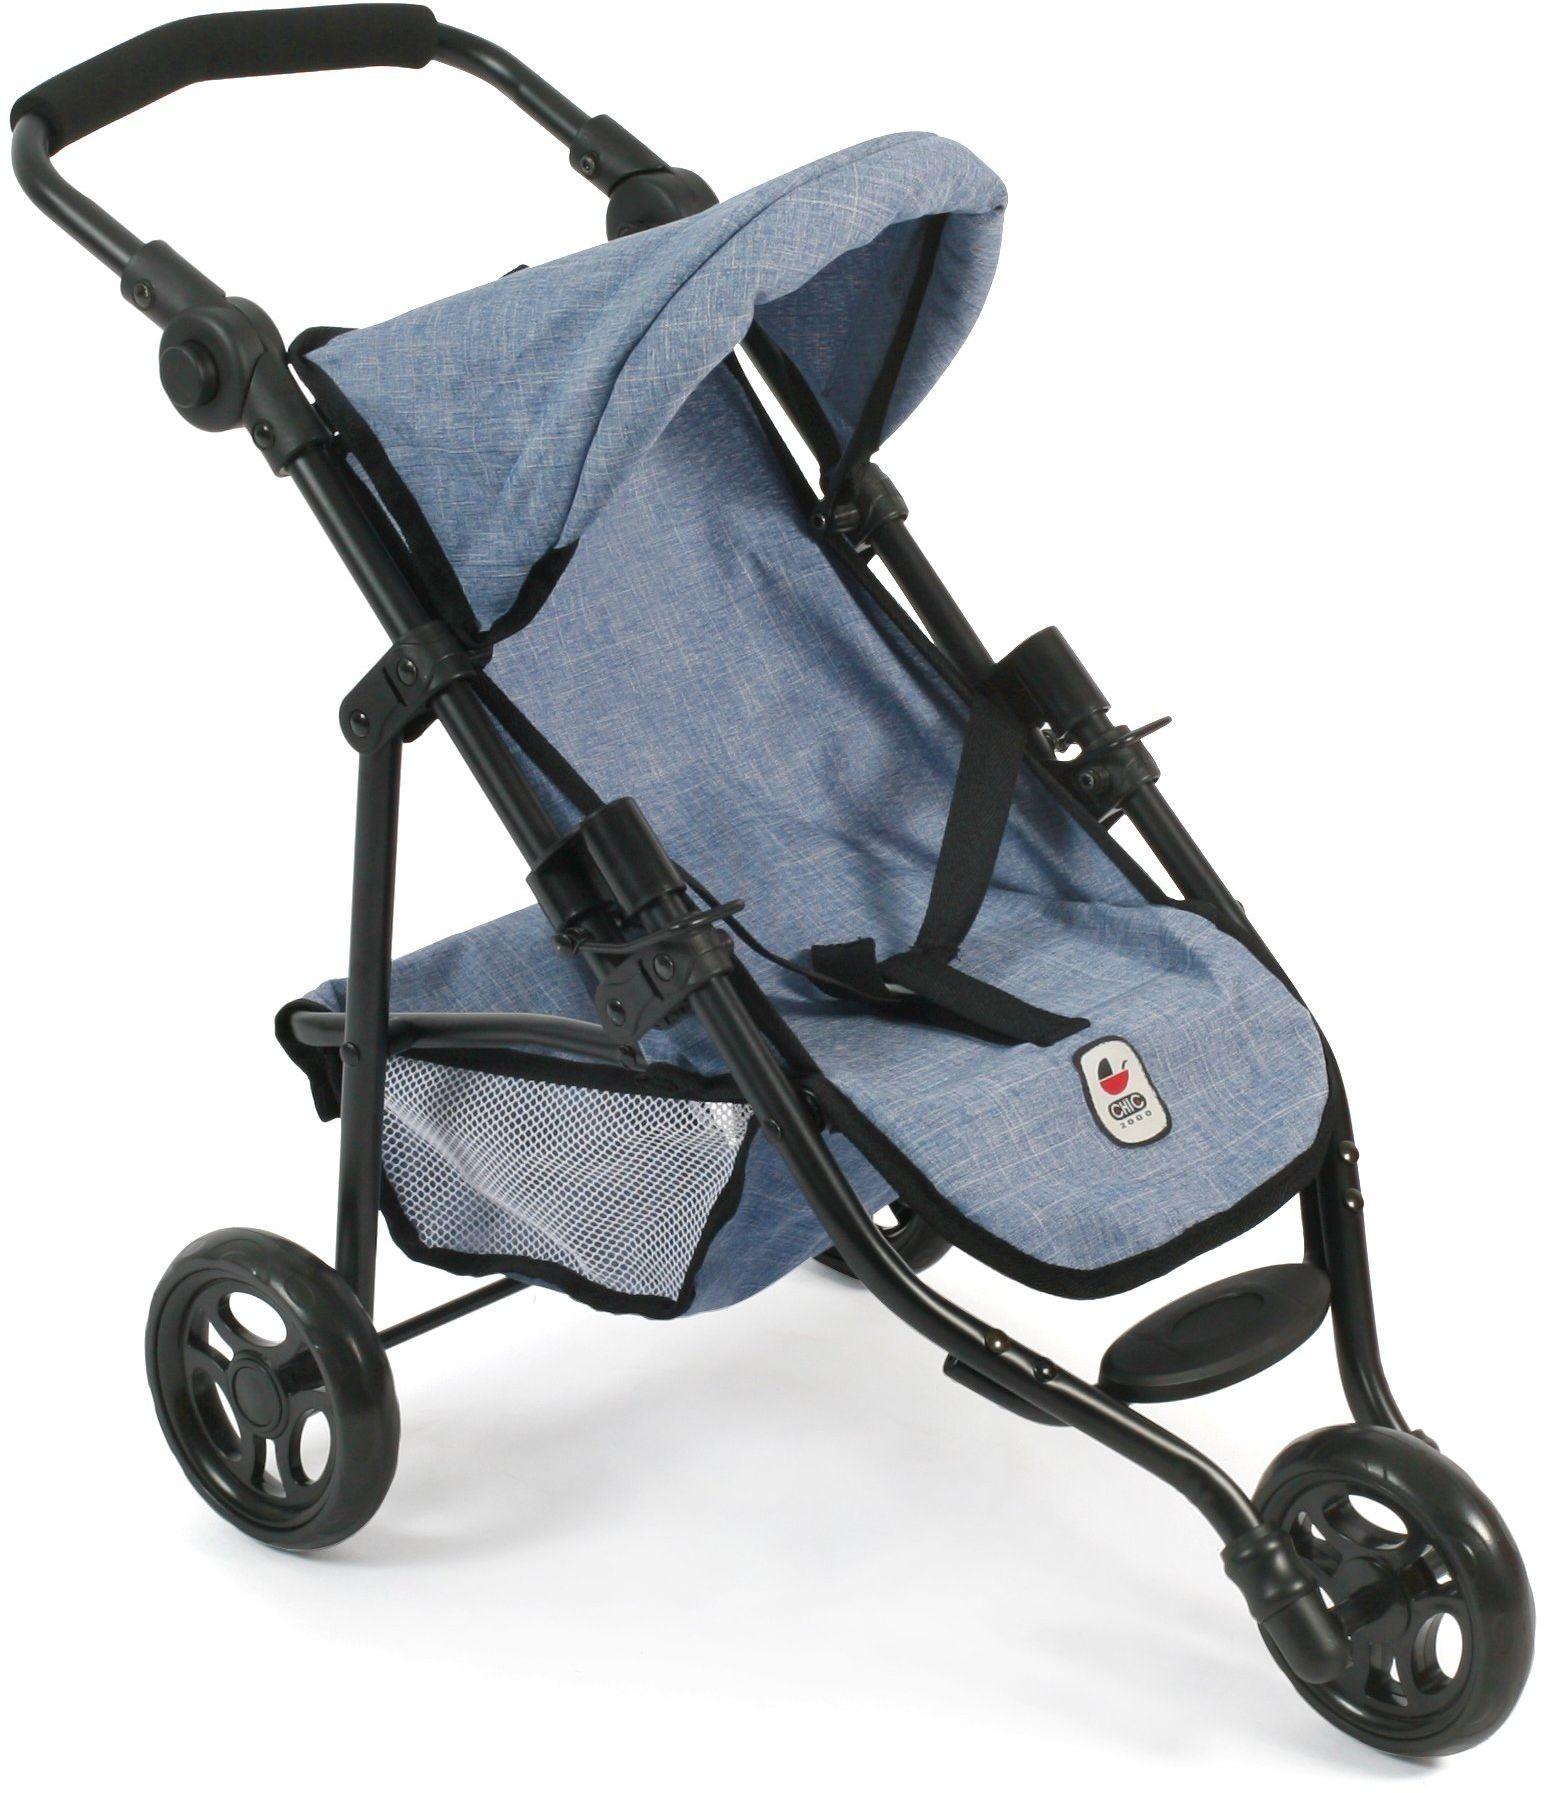 "Bayer Chic 2000 612 50 - Jogging Buggy""Lola"", mały wózek dla lalek do 50 cm, Jeans Blue"